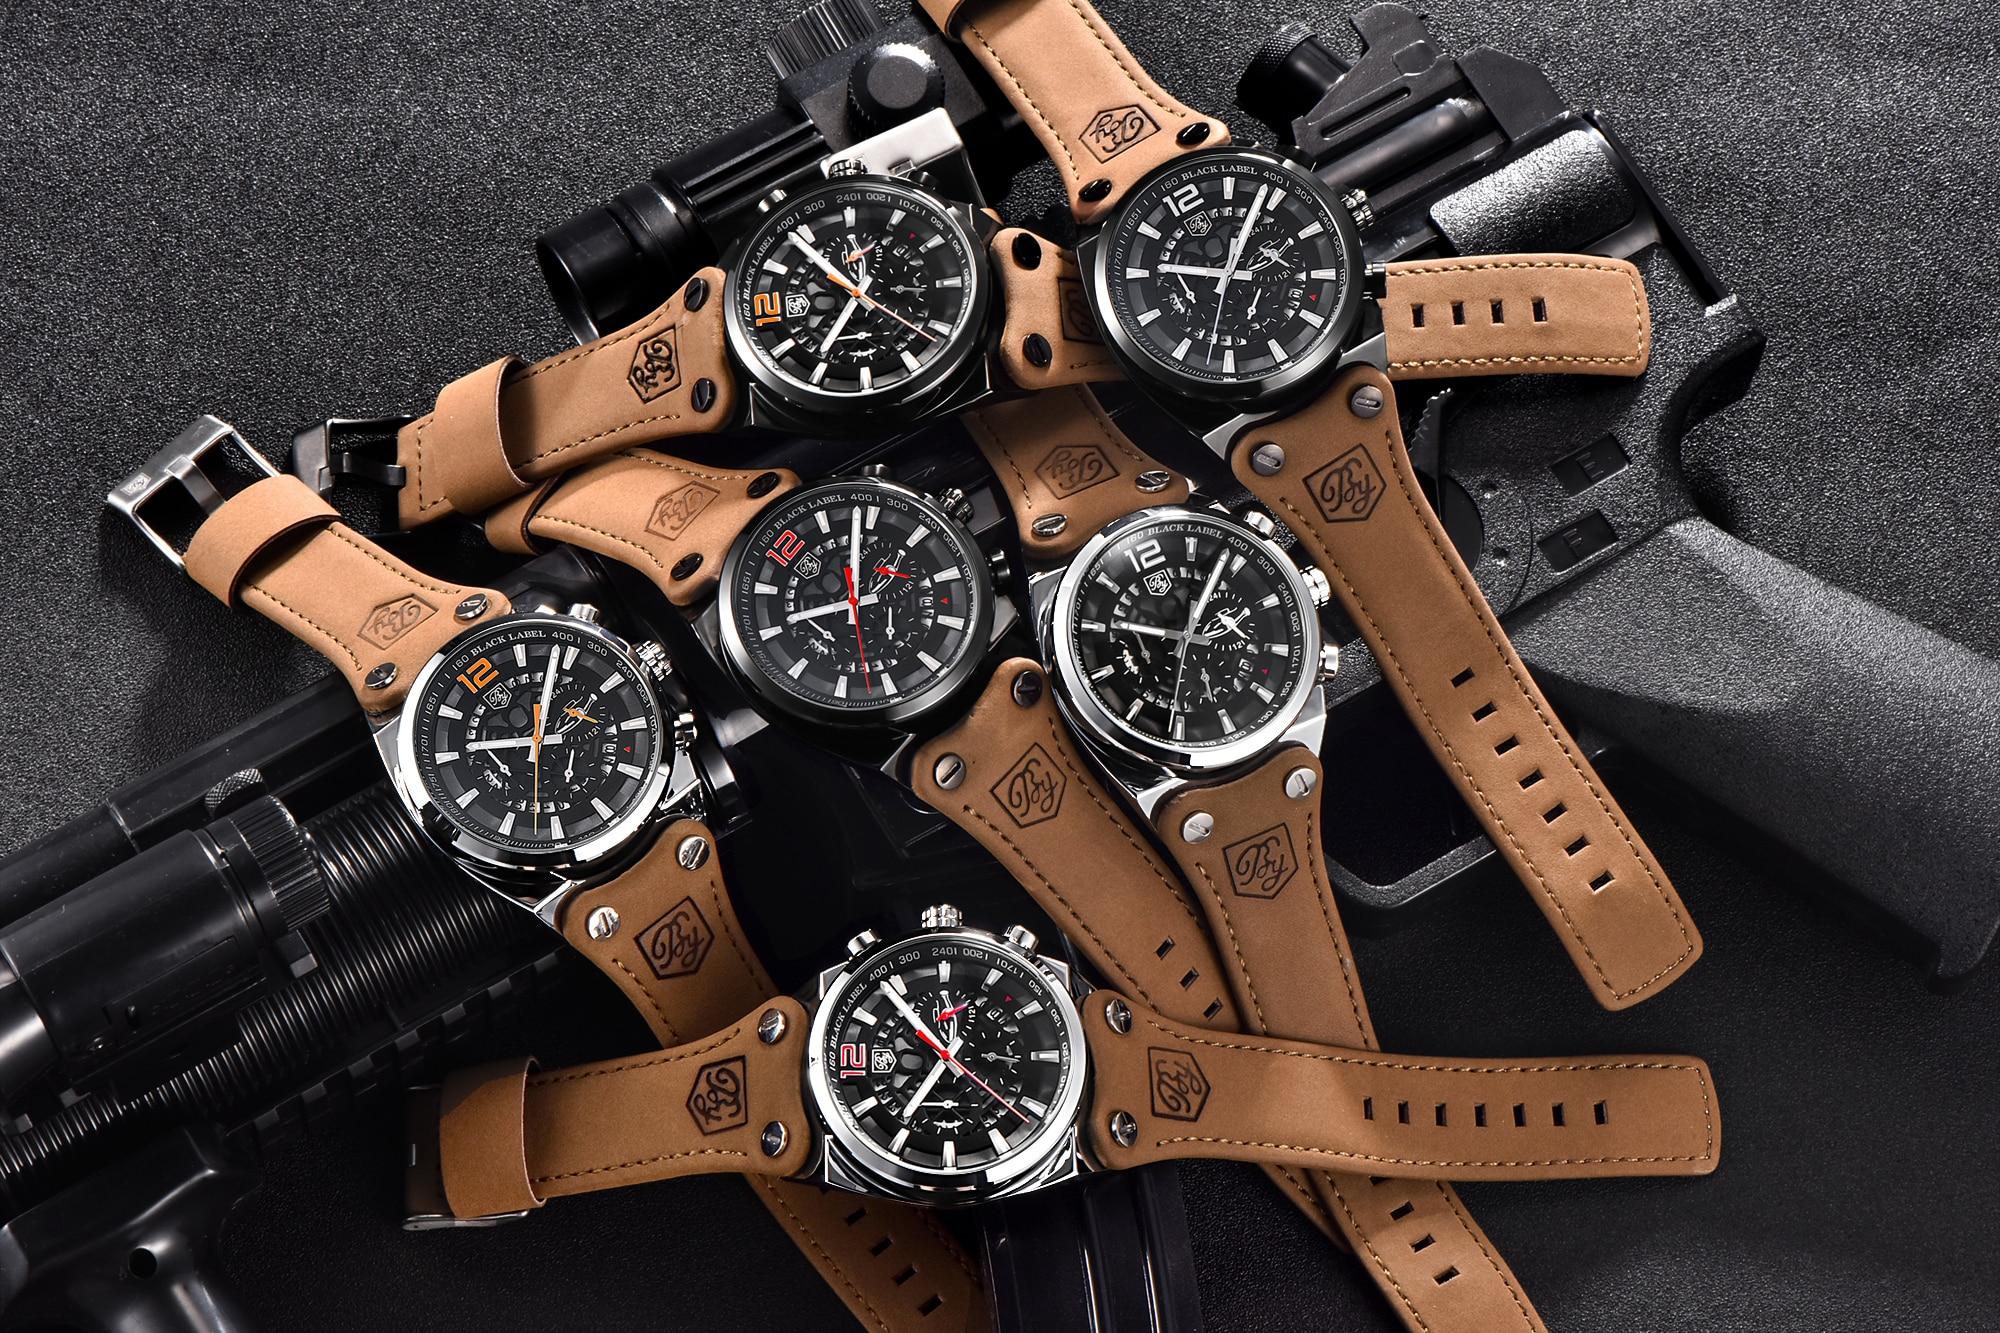 BENYAR Big Dial Sport Watch Men Waterproof Outdoor Military Chronograph Quartz Leather Watch Army Male Clock Relogio Masculino 3